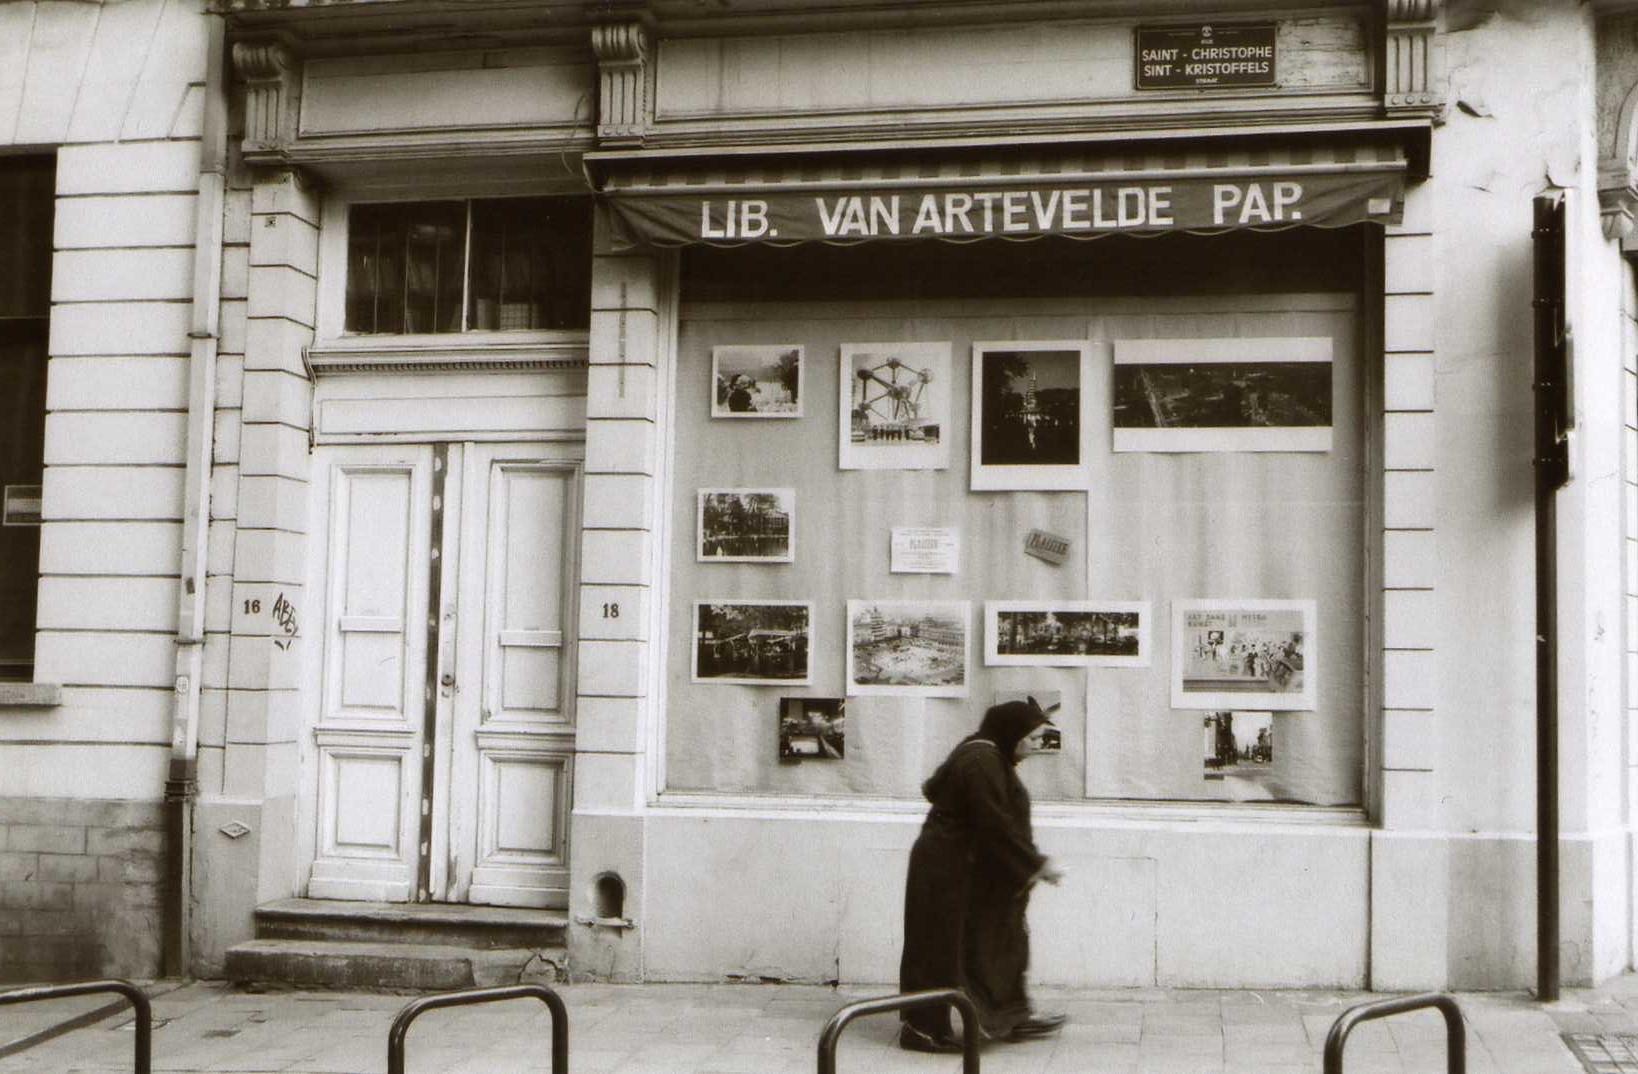 Brussel Lib. Van Artevelde Pap.